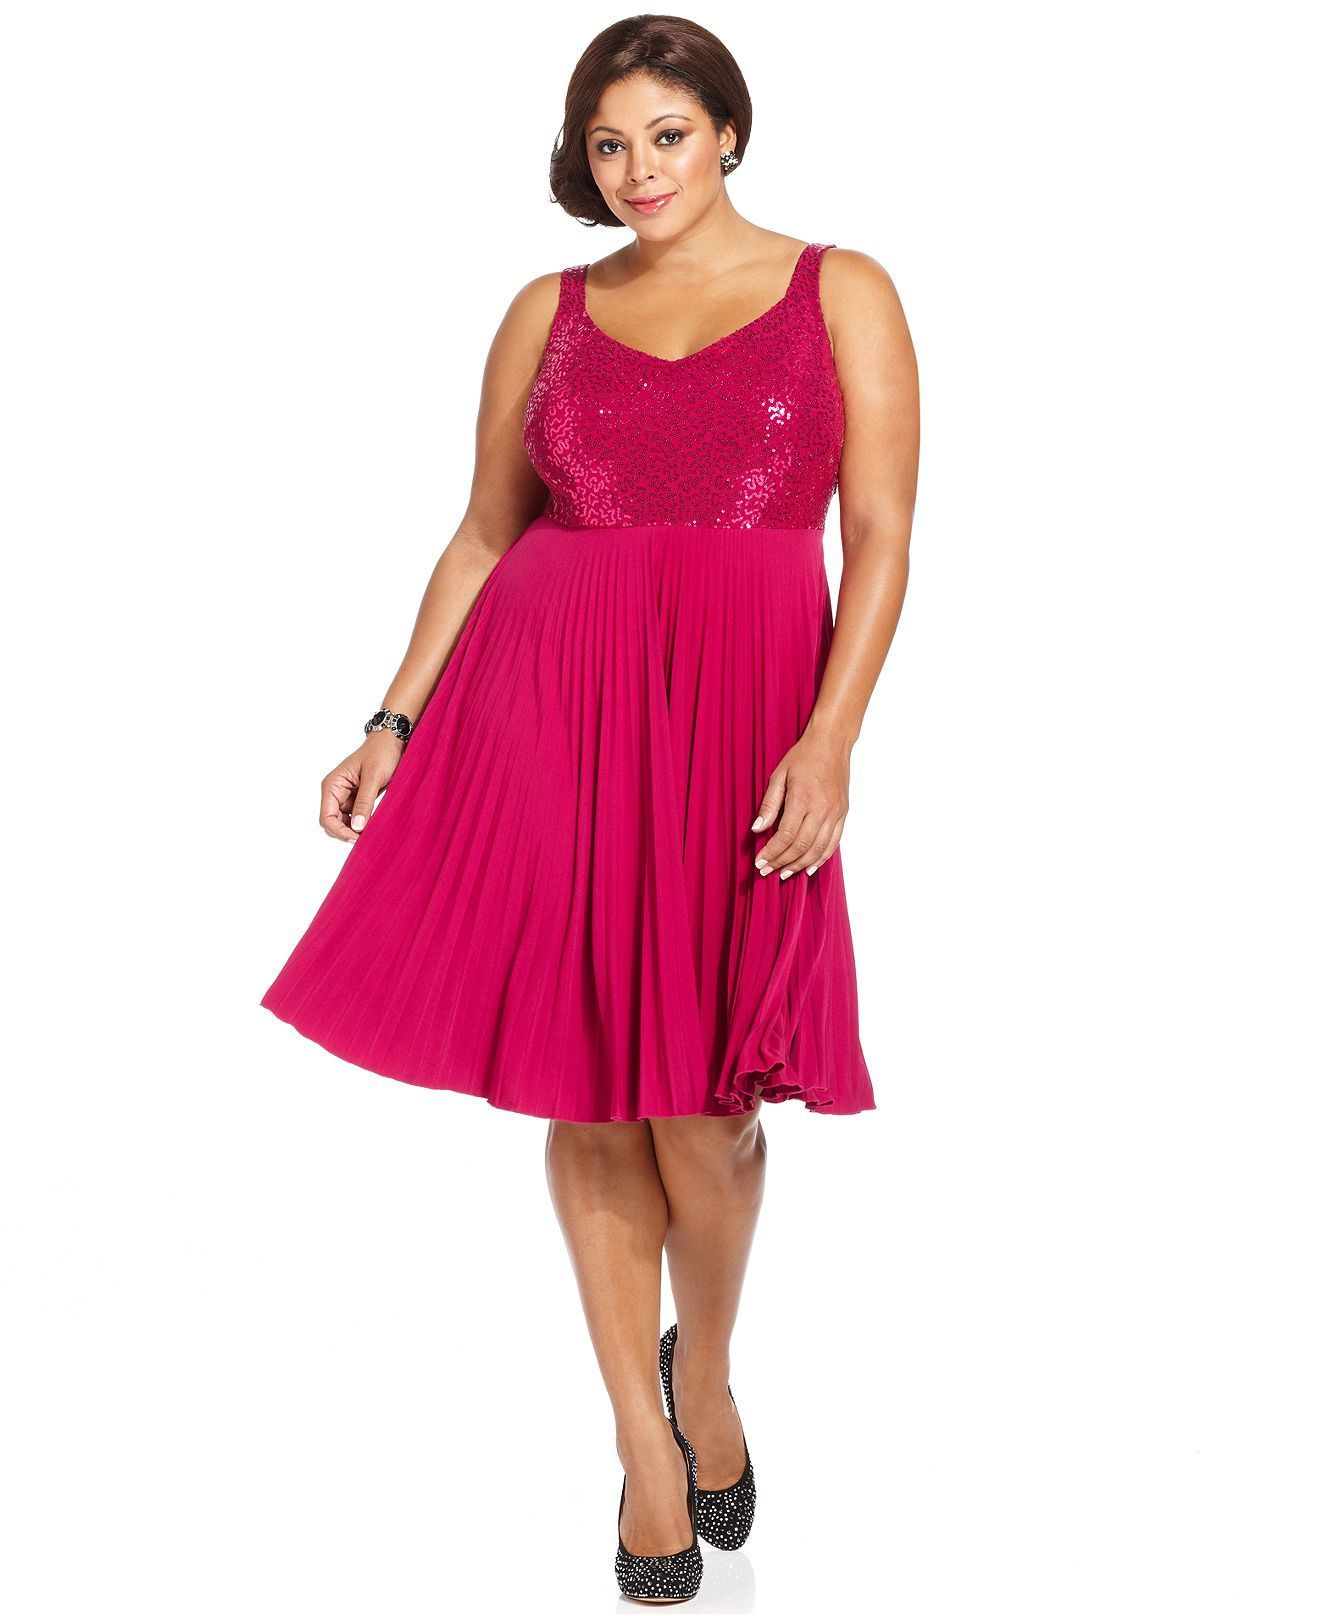 spense plus size dress, sleeveless sequin pleated a-line - plus